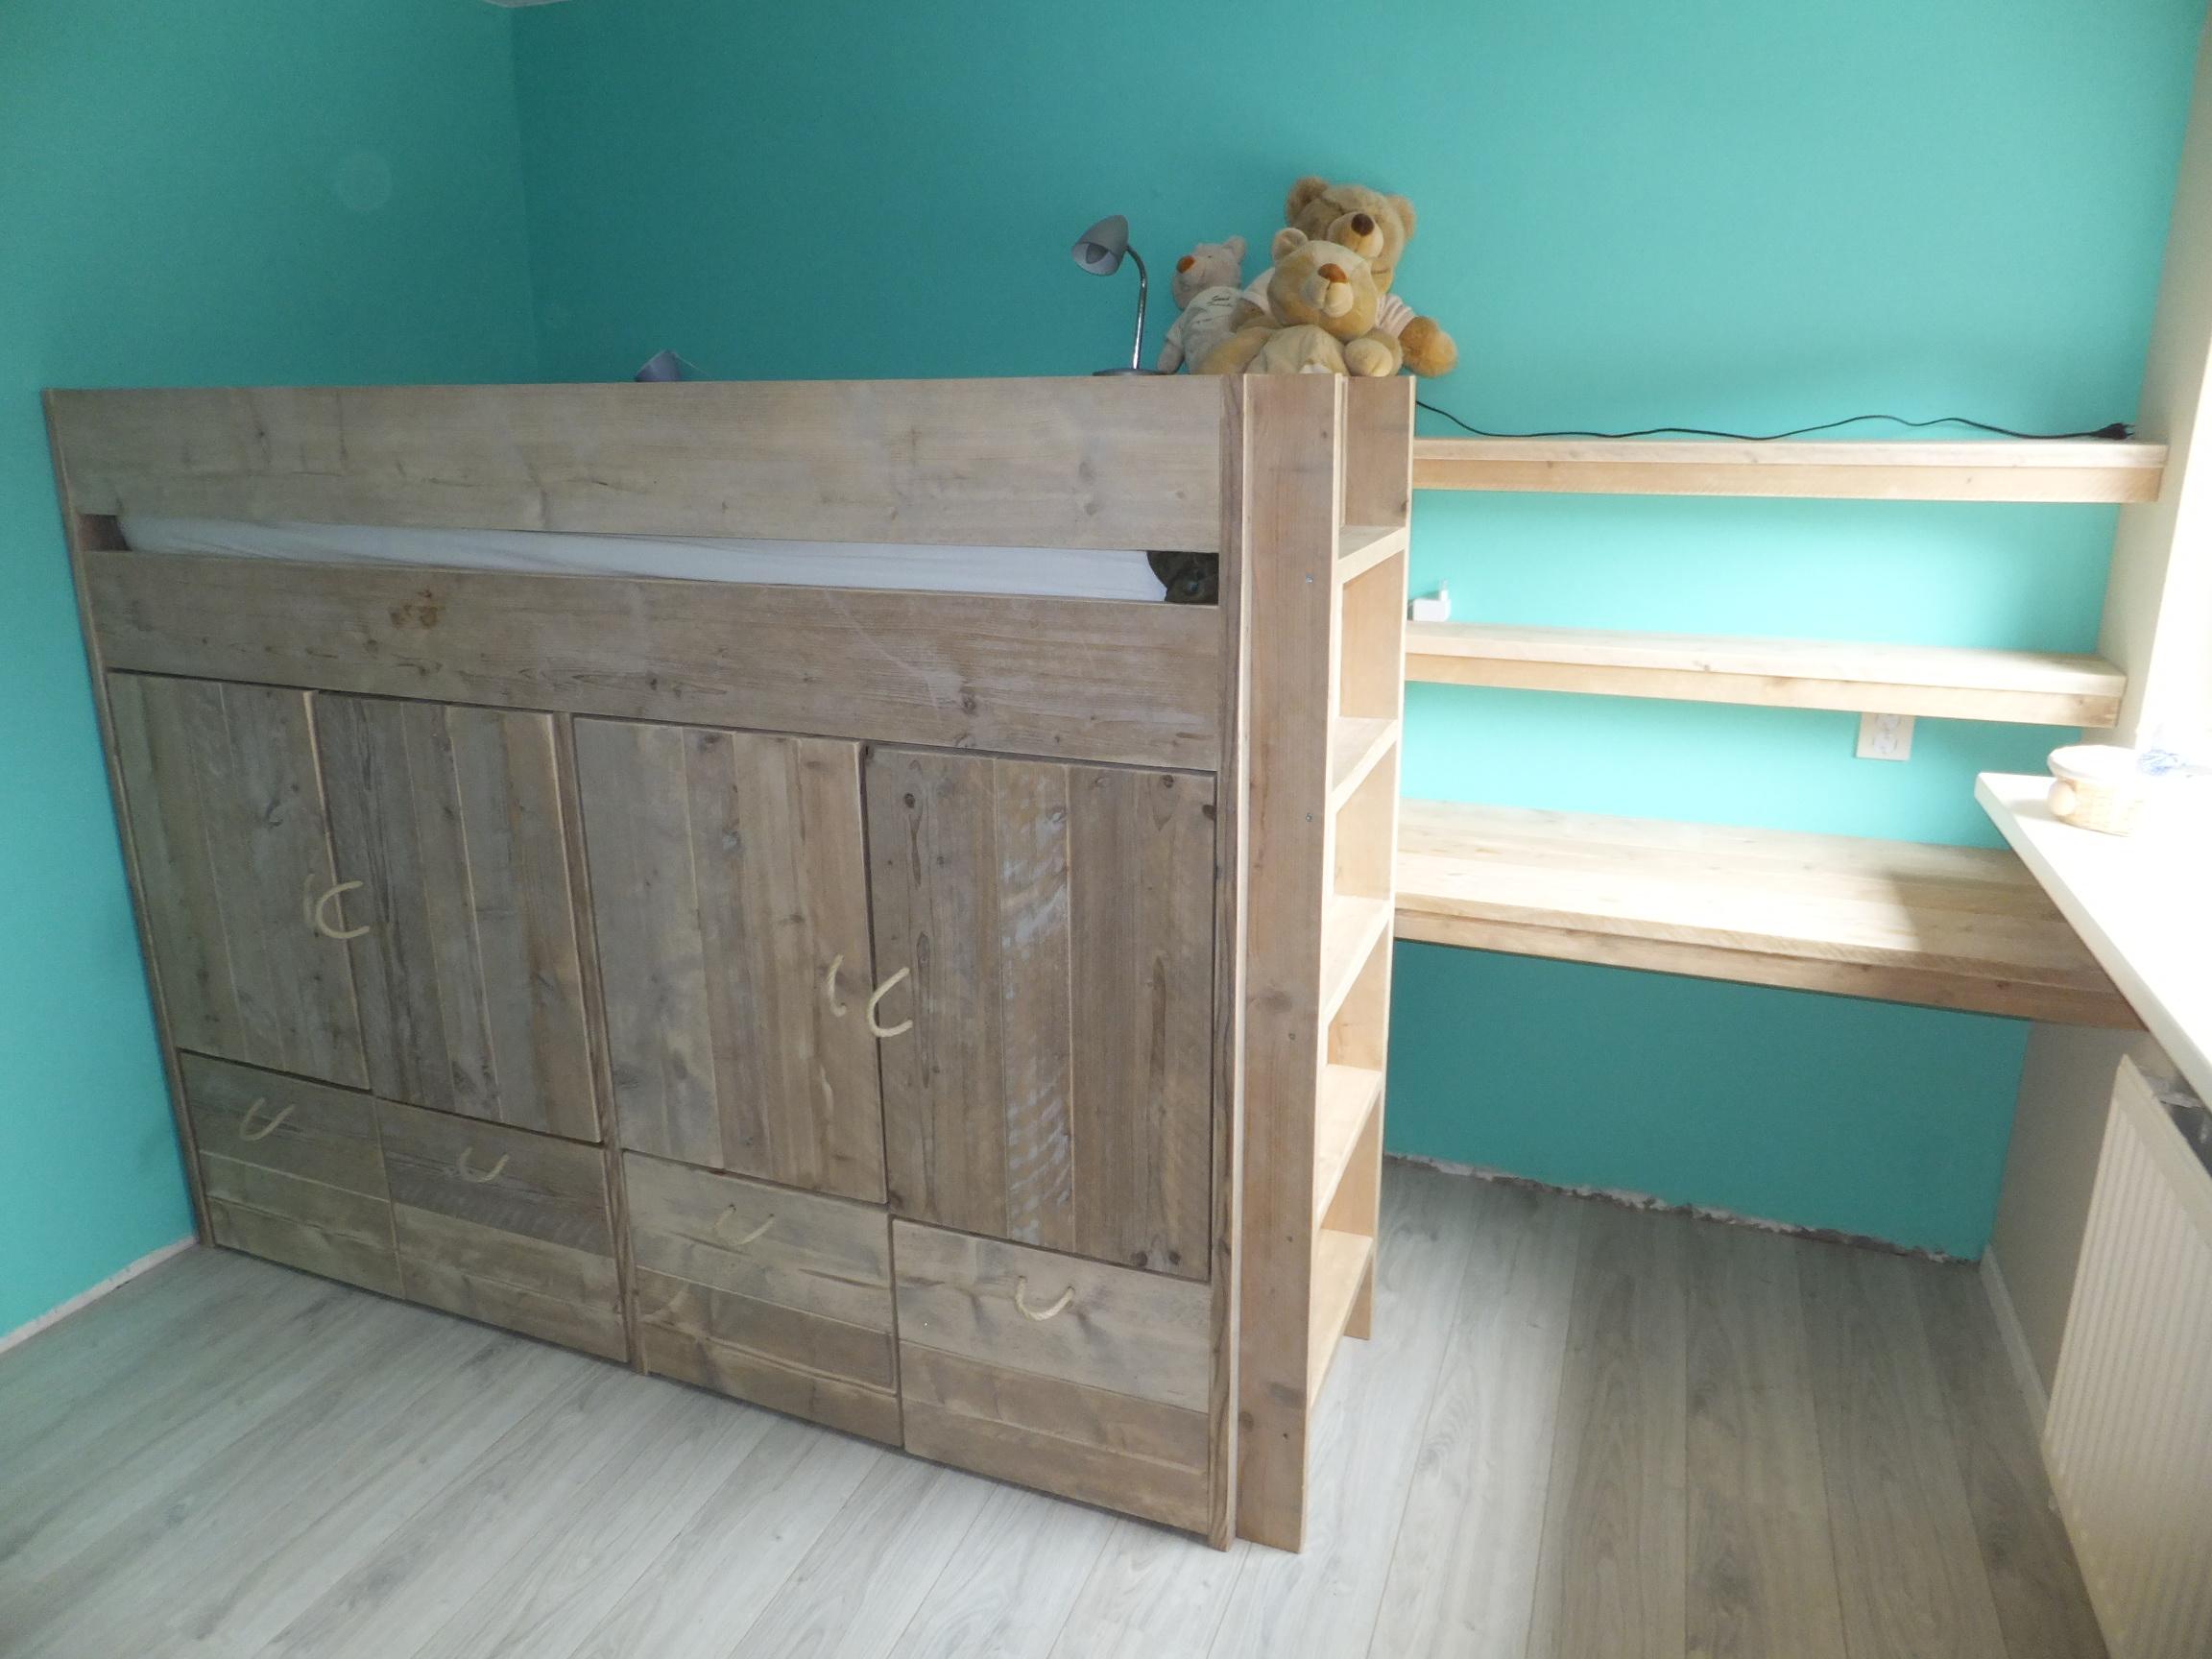 Hoogslaper Met Kast : ≥ steigerhouten halfhoogslaper incl kast tip slaapkamer